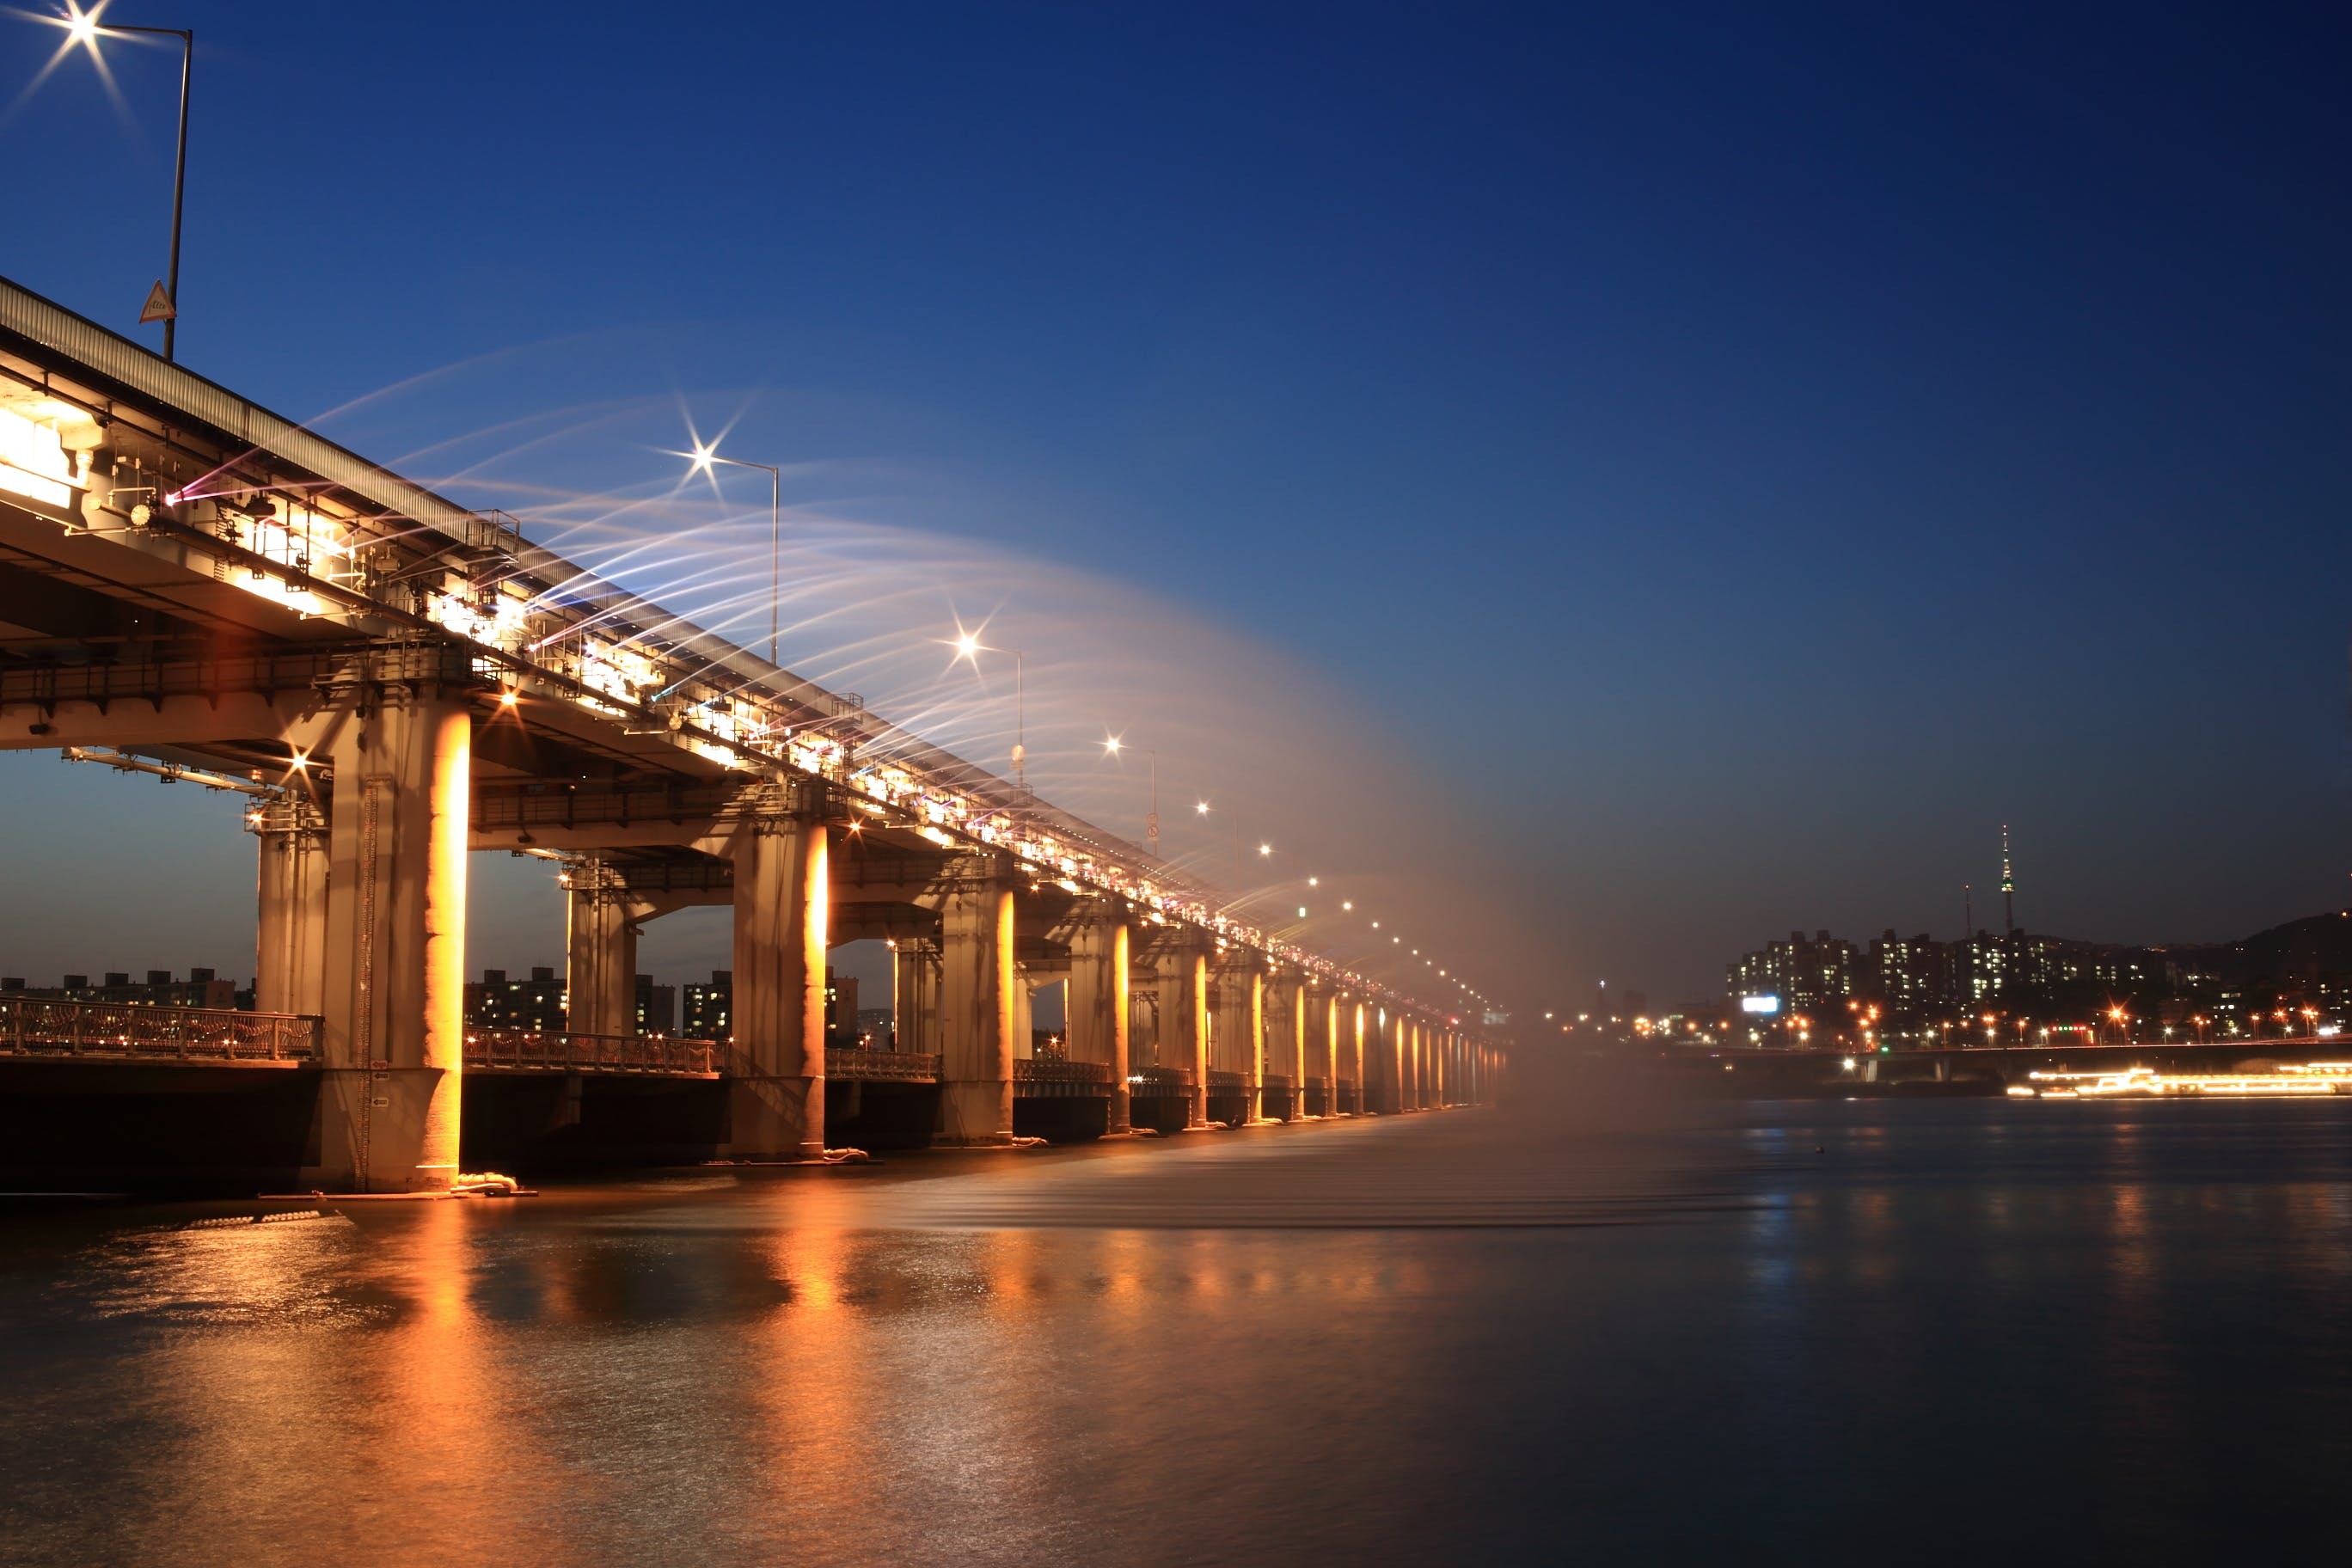 Gray Concrete Bridge With Sprinklers